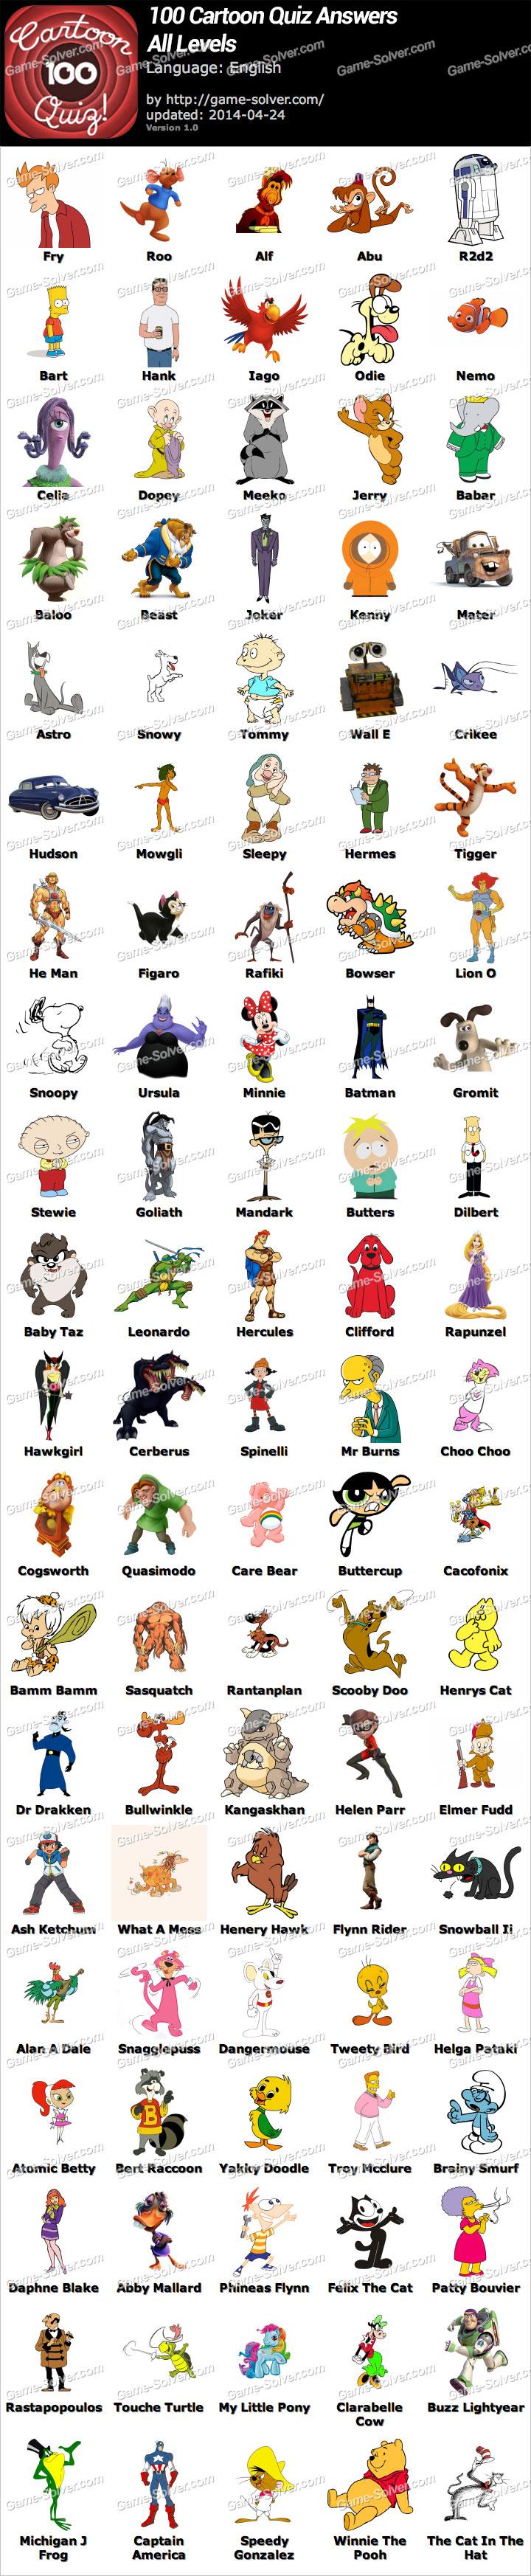 100-Cartoon-Quiz-All-Levels-Answers